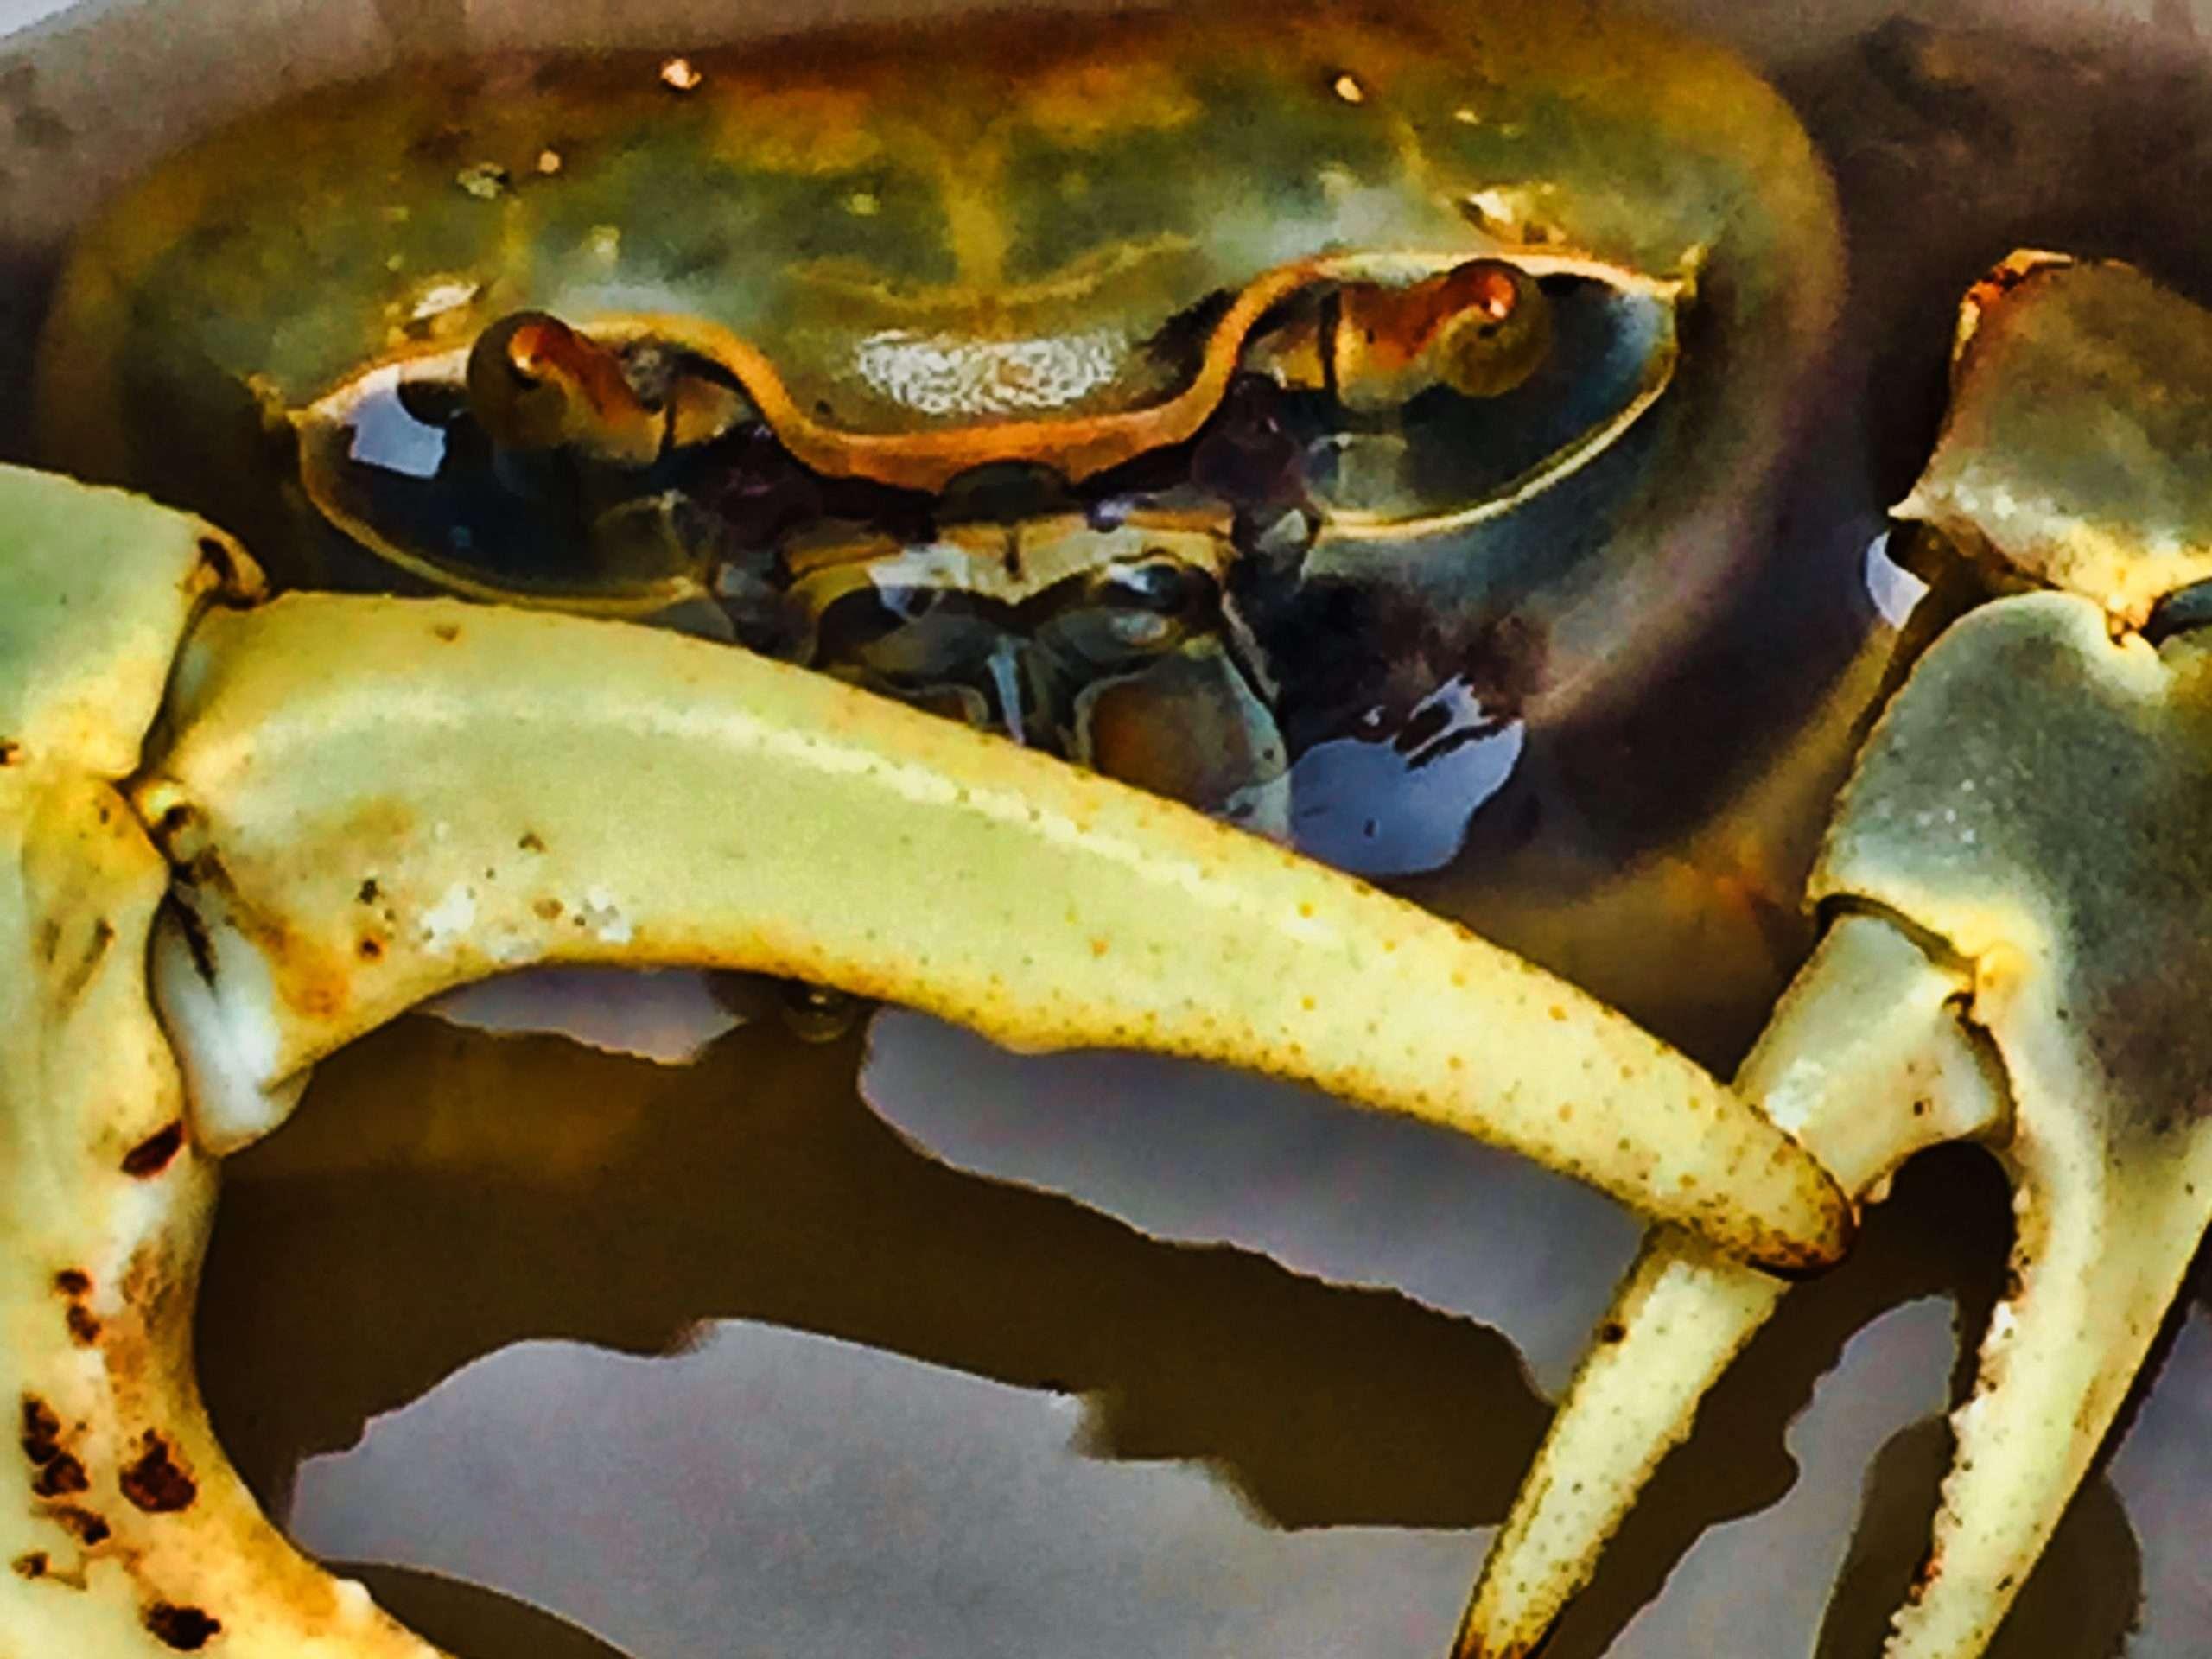 camera-phone-crab-IMG_0332-scaled.